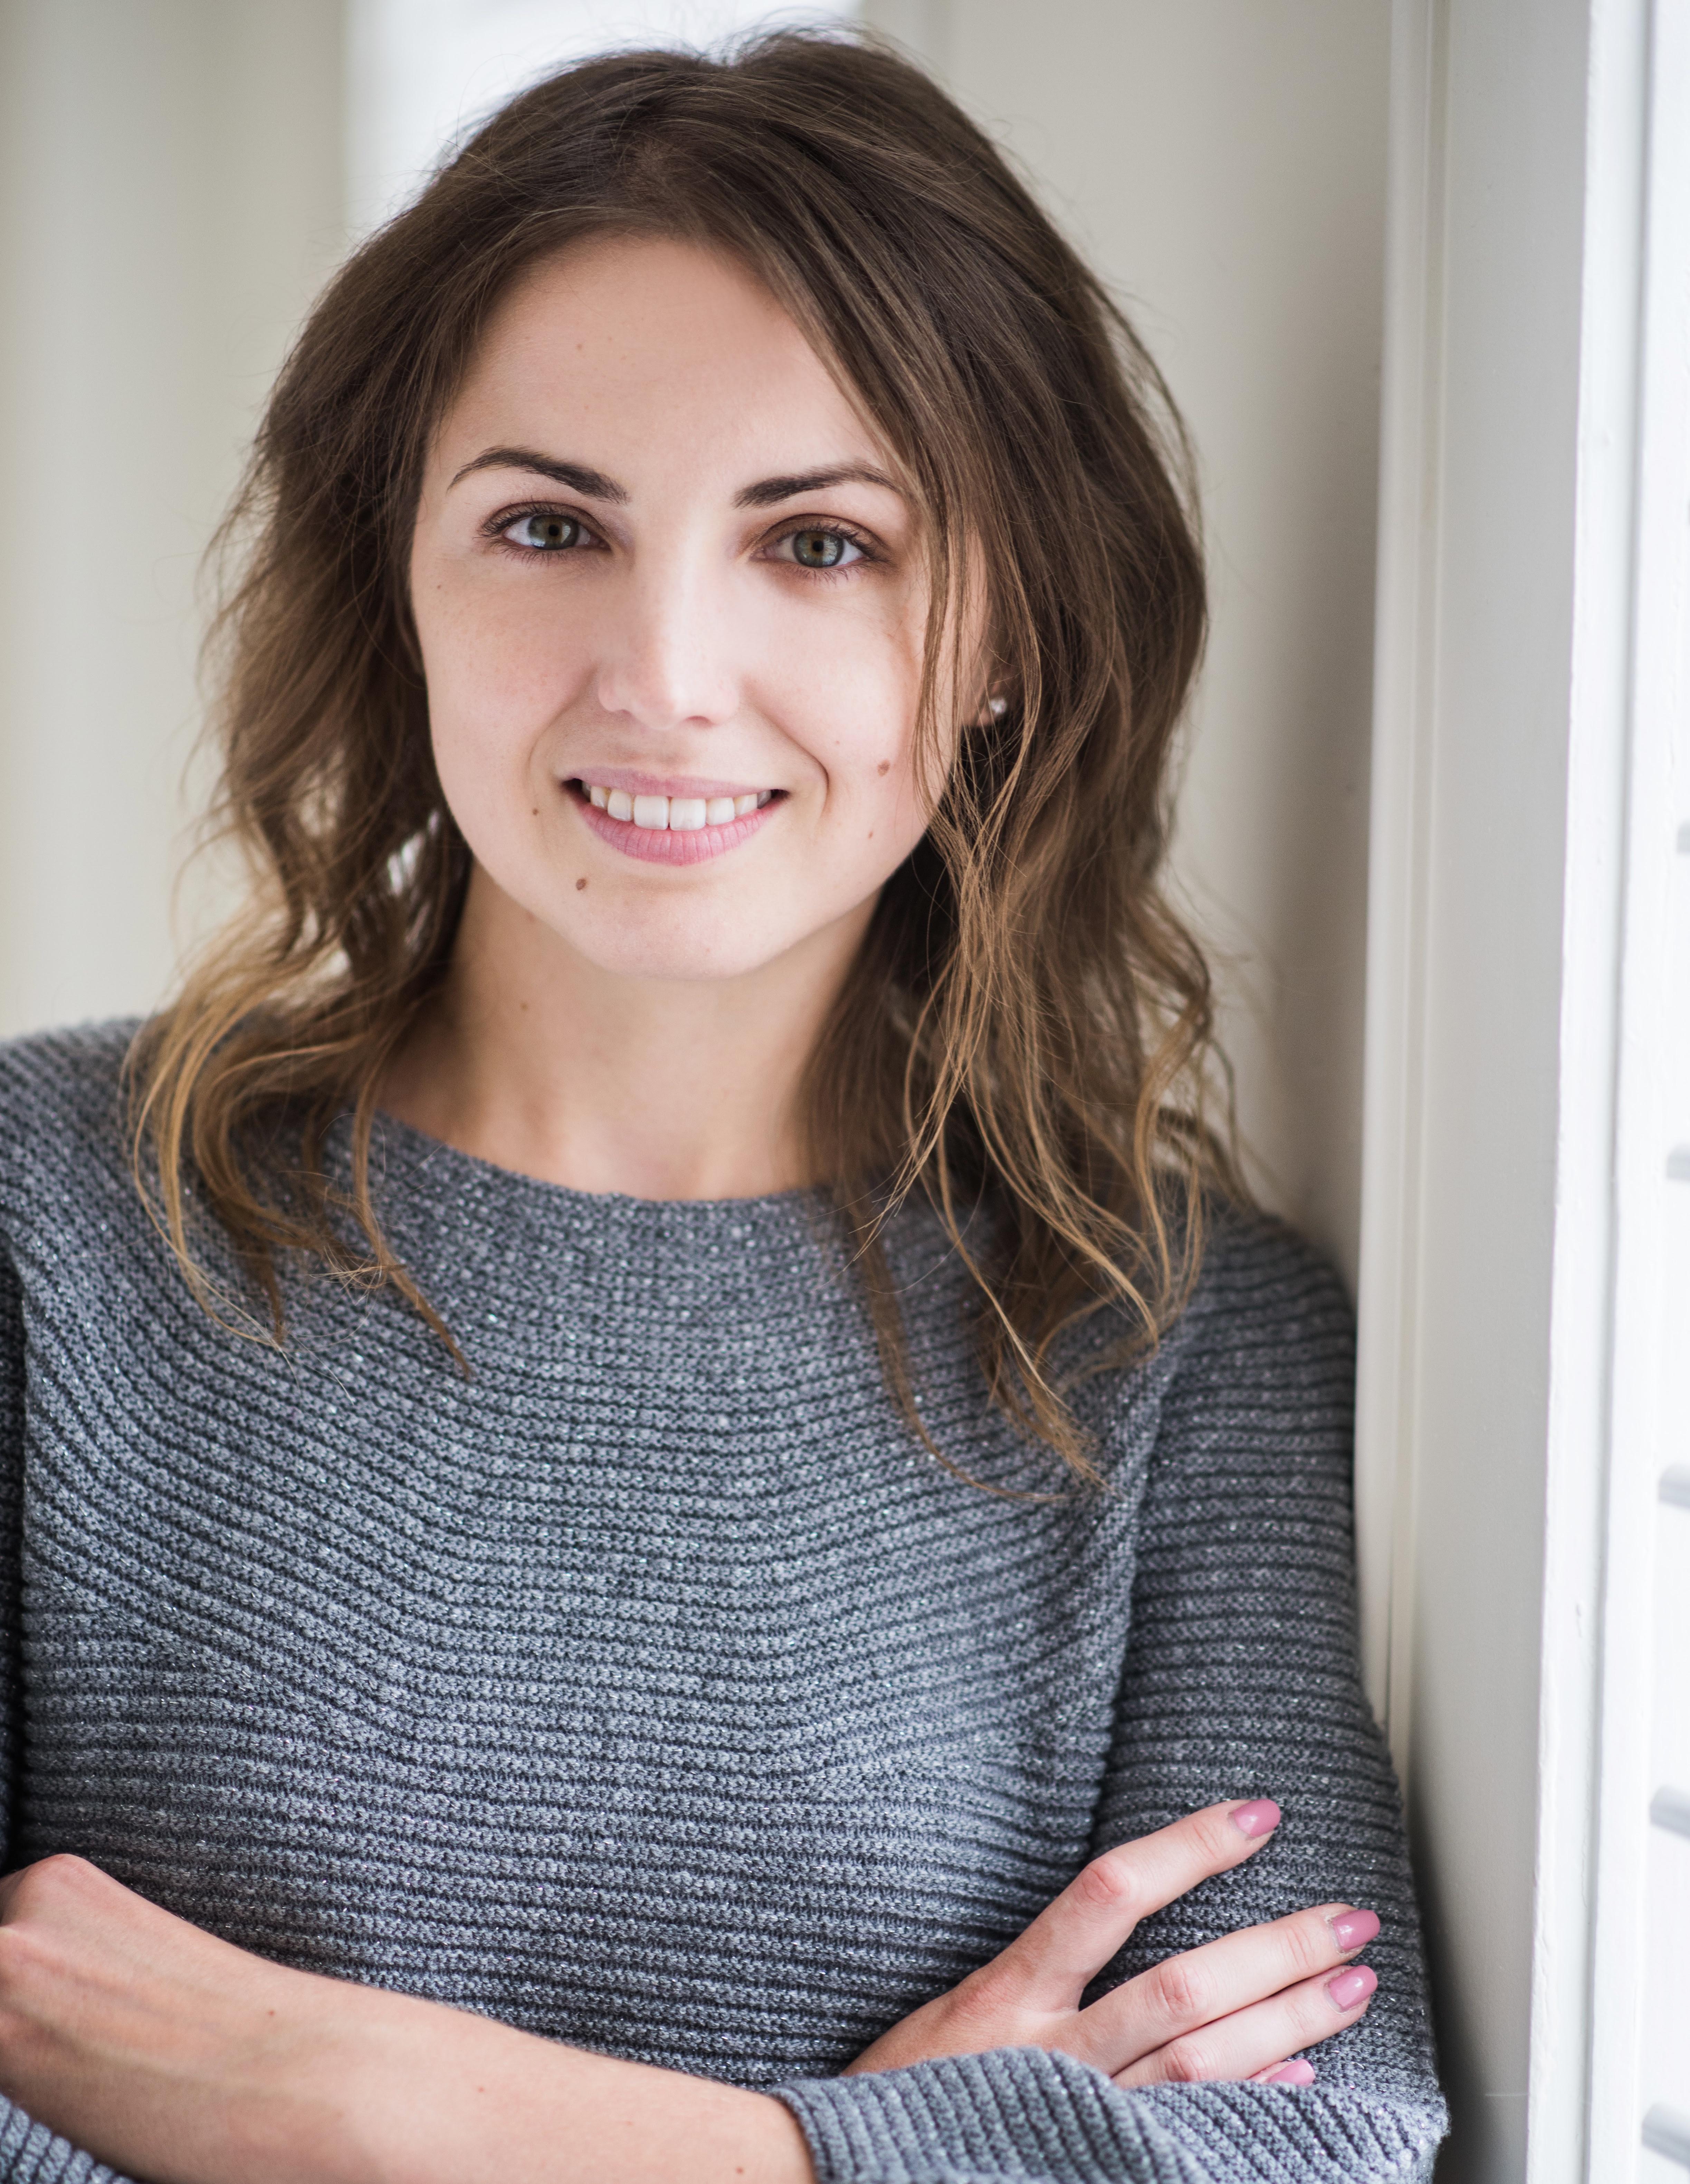 Greta Cutulenco